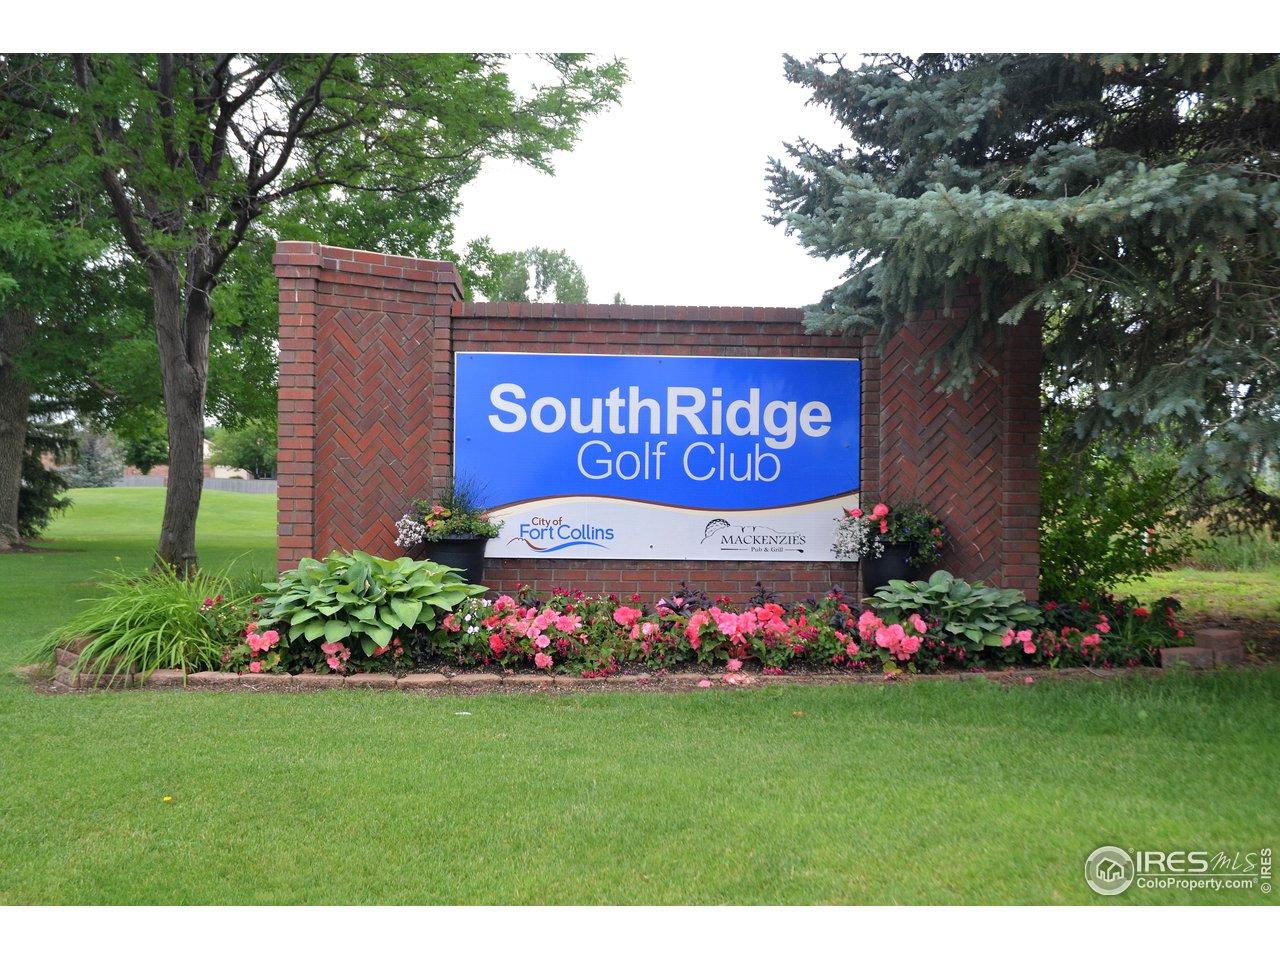 Public Southridge Golf Club--18 hold course